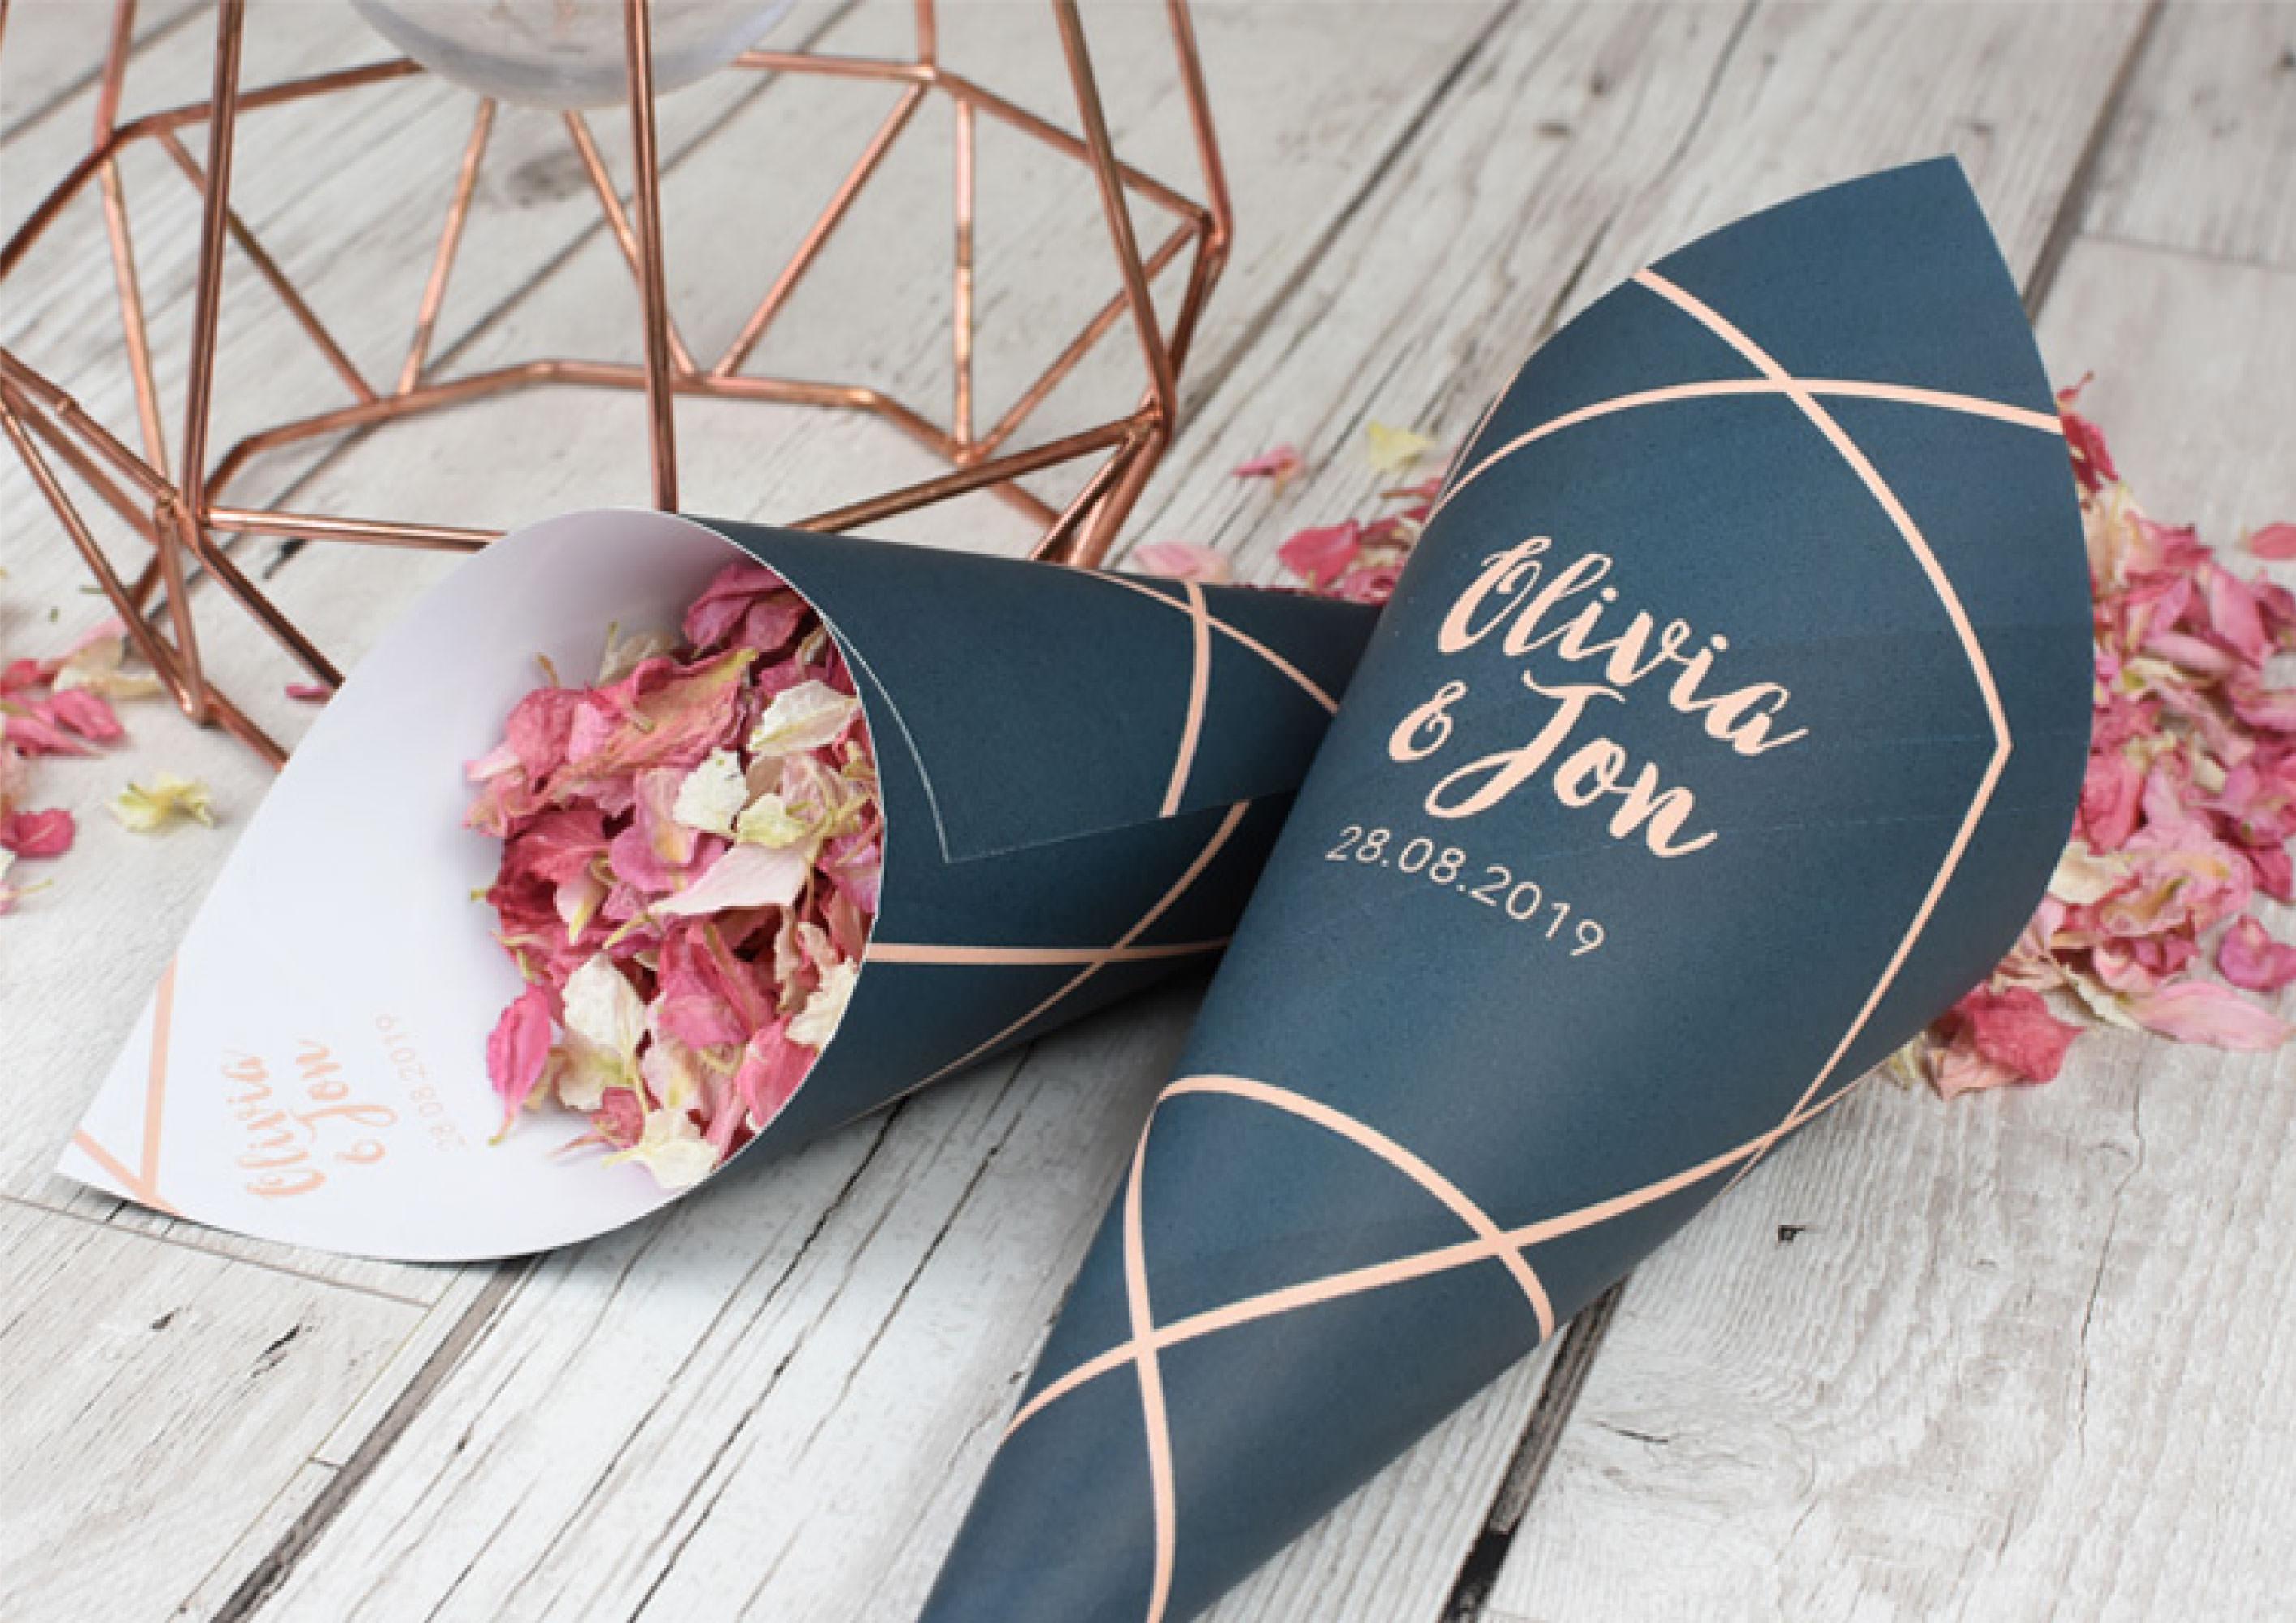 shropshire-petals-bespoke-packaging